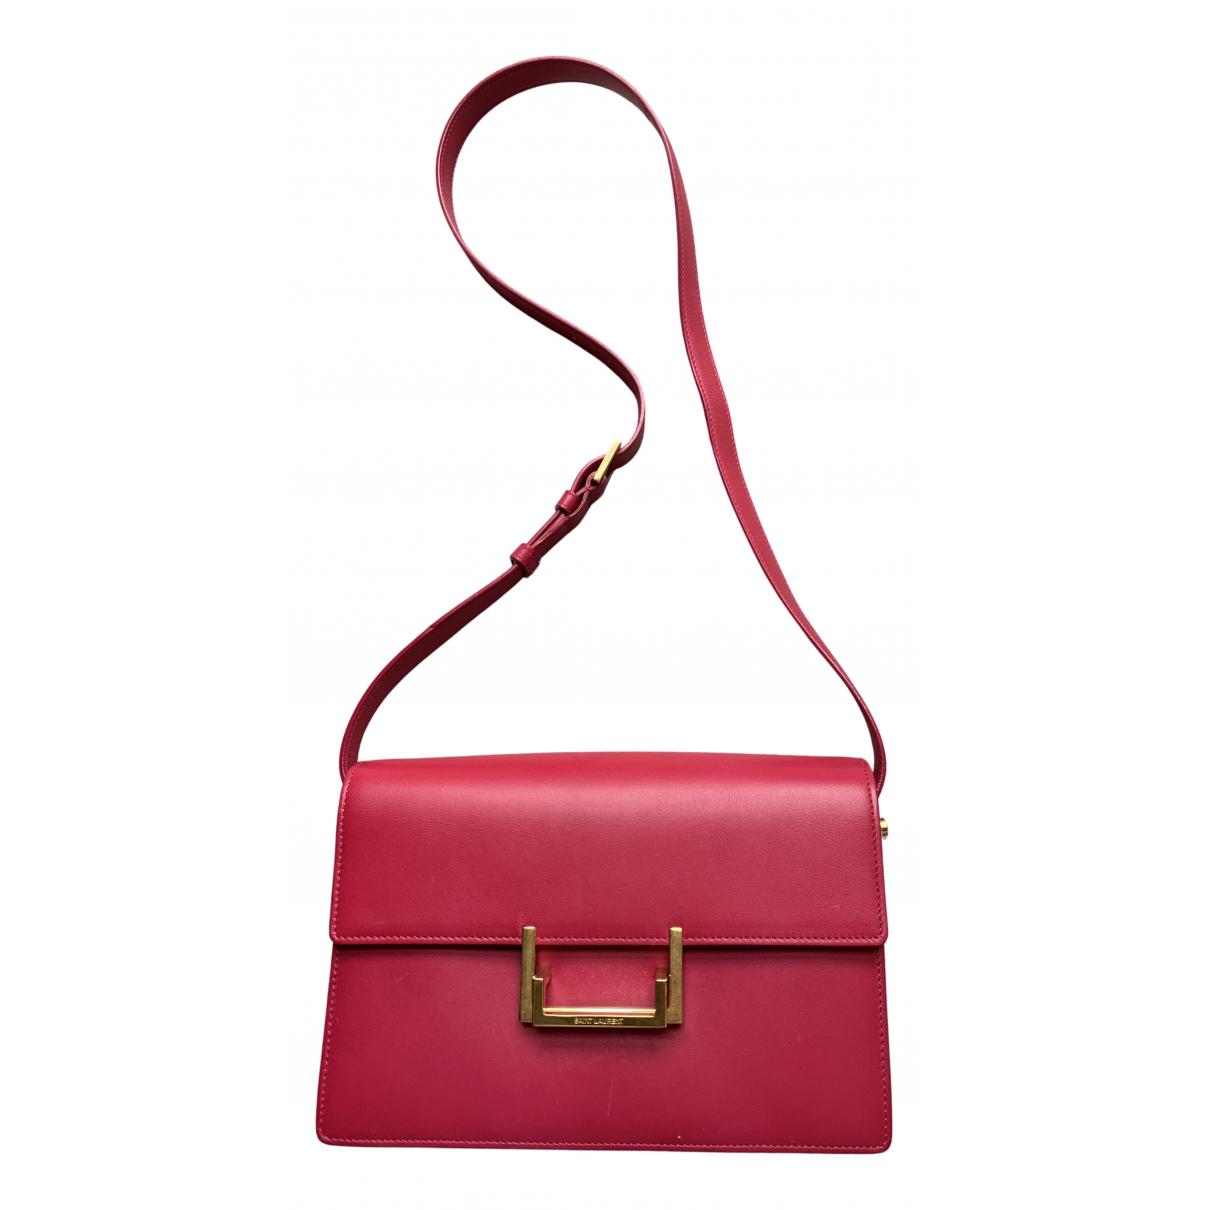 Saint Laurent N Pink Leather handbag for Women N